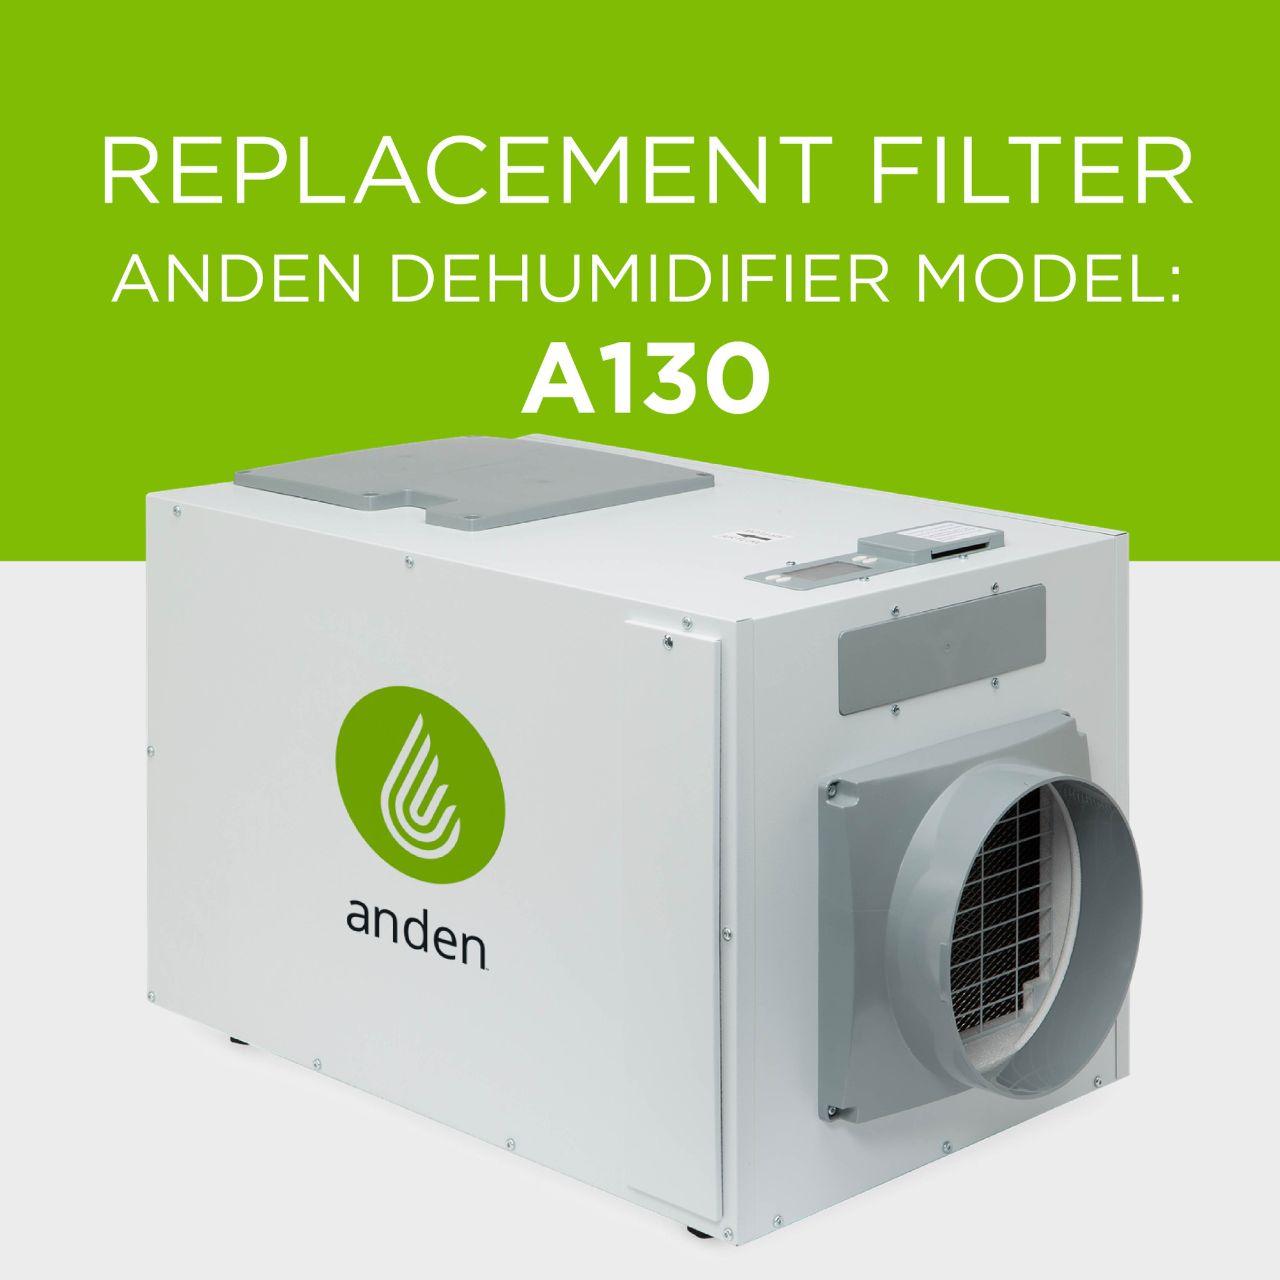 Anden-Model-A130-Dehumidifier-Replacement-Air Filter